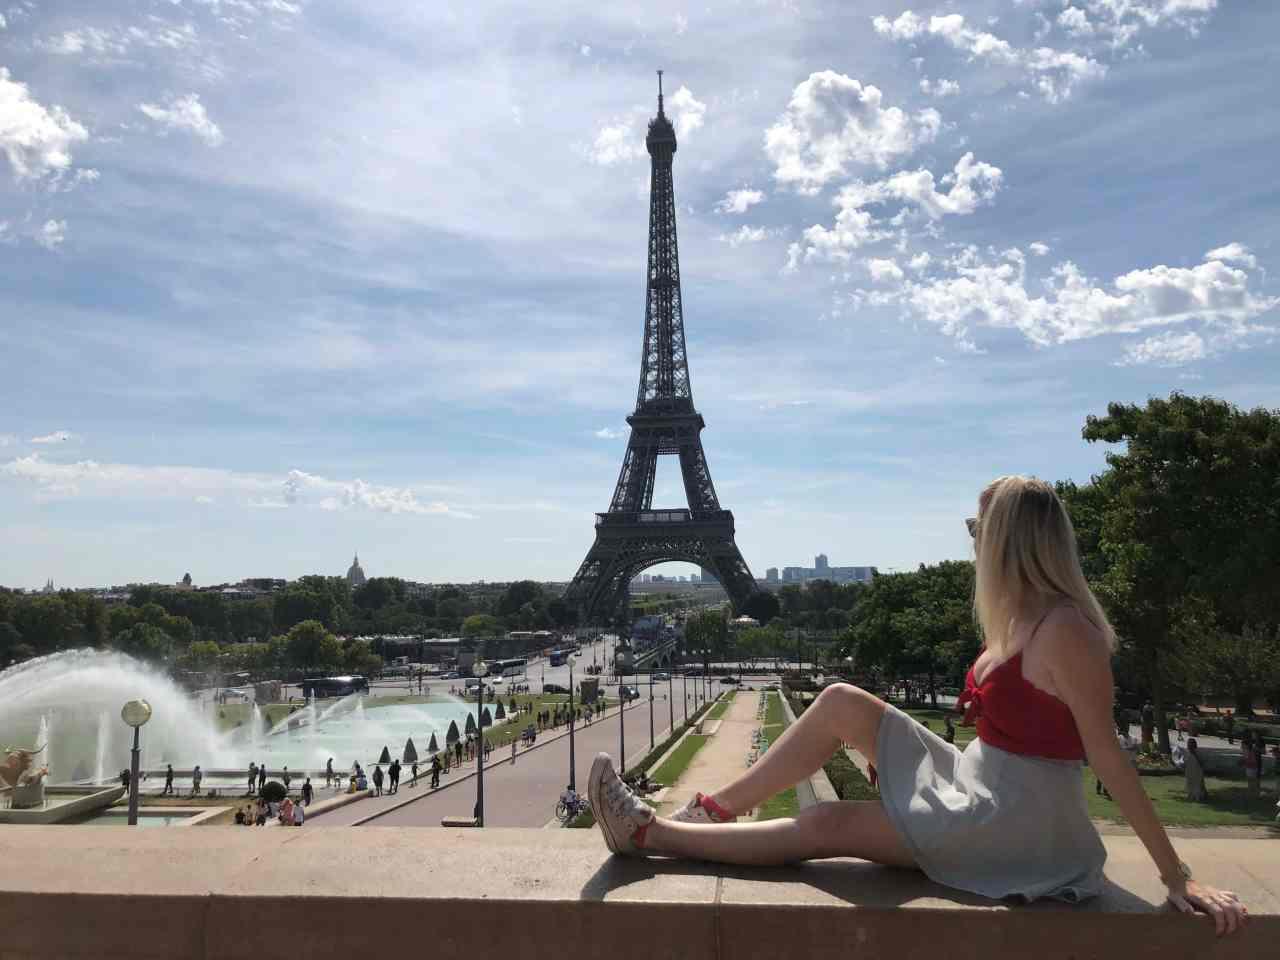 Trocadero Eiffel Tower Paris Instagram wall